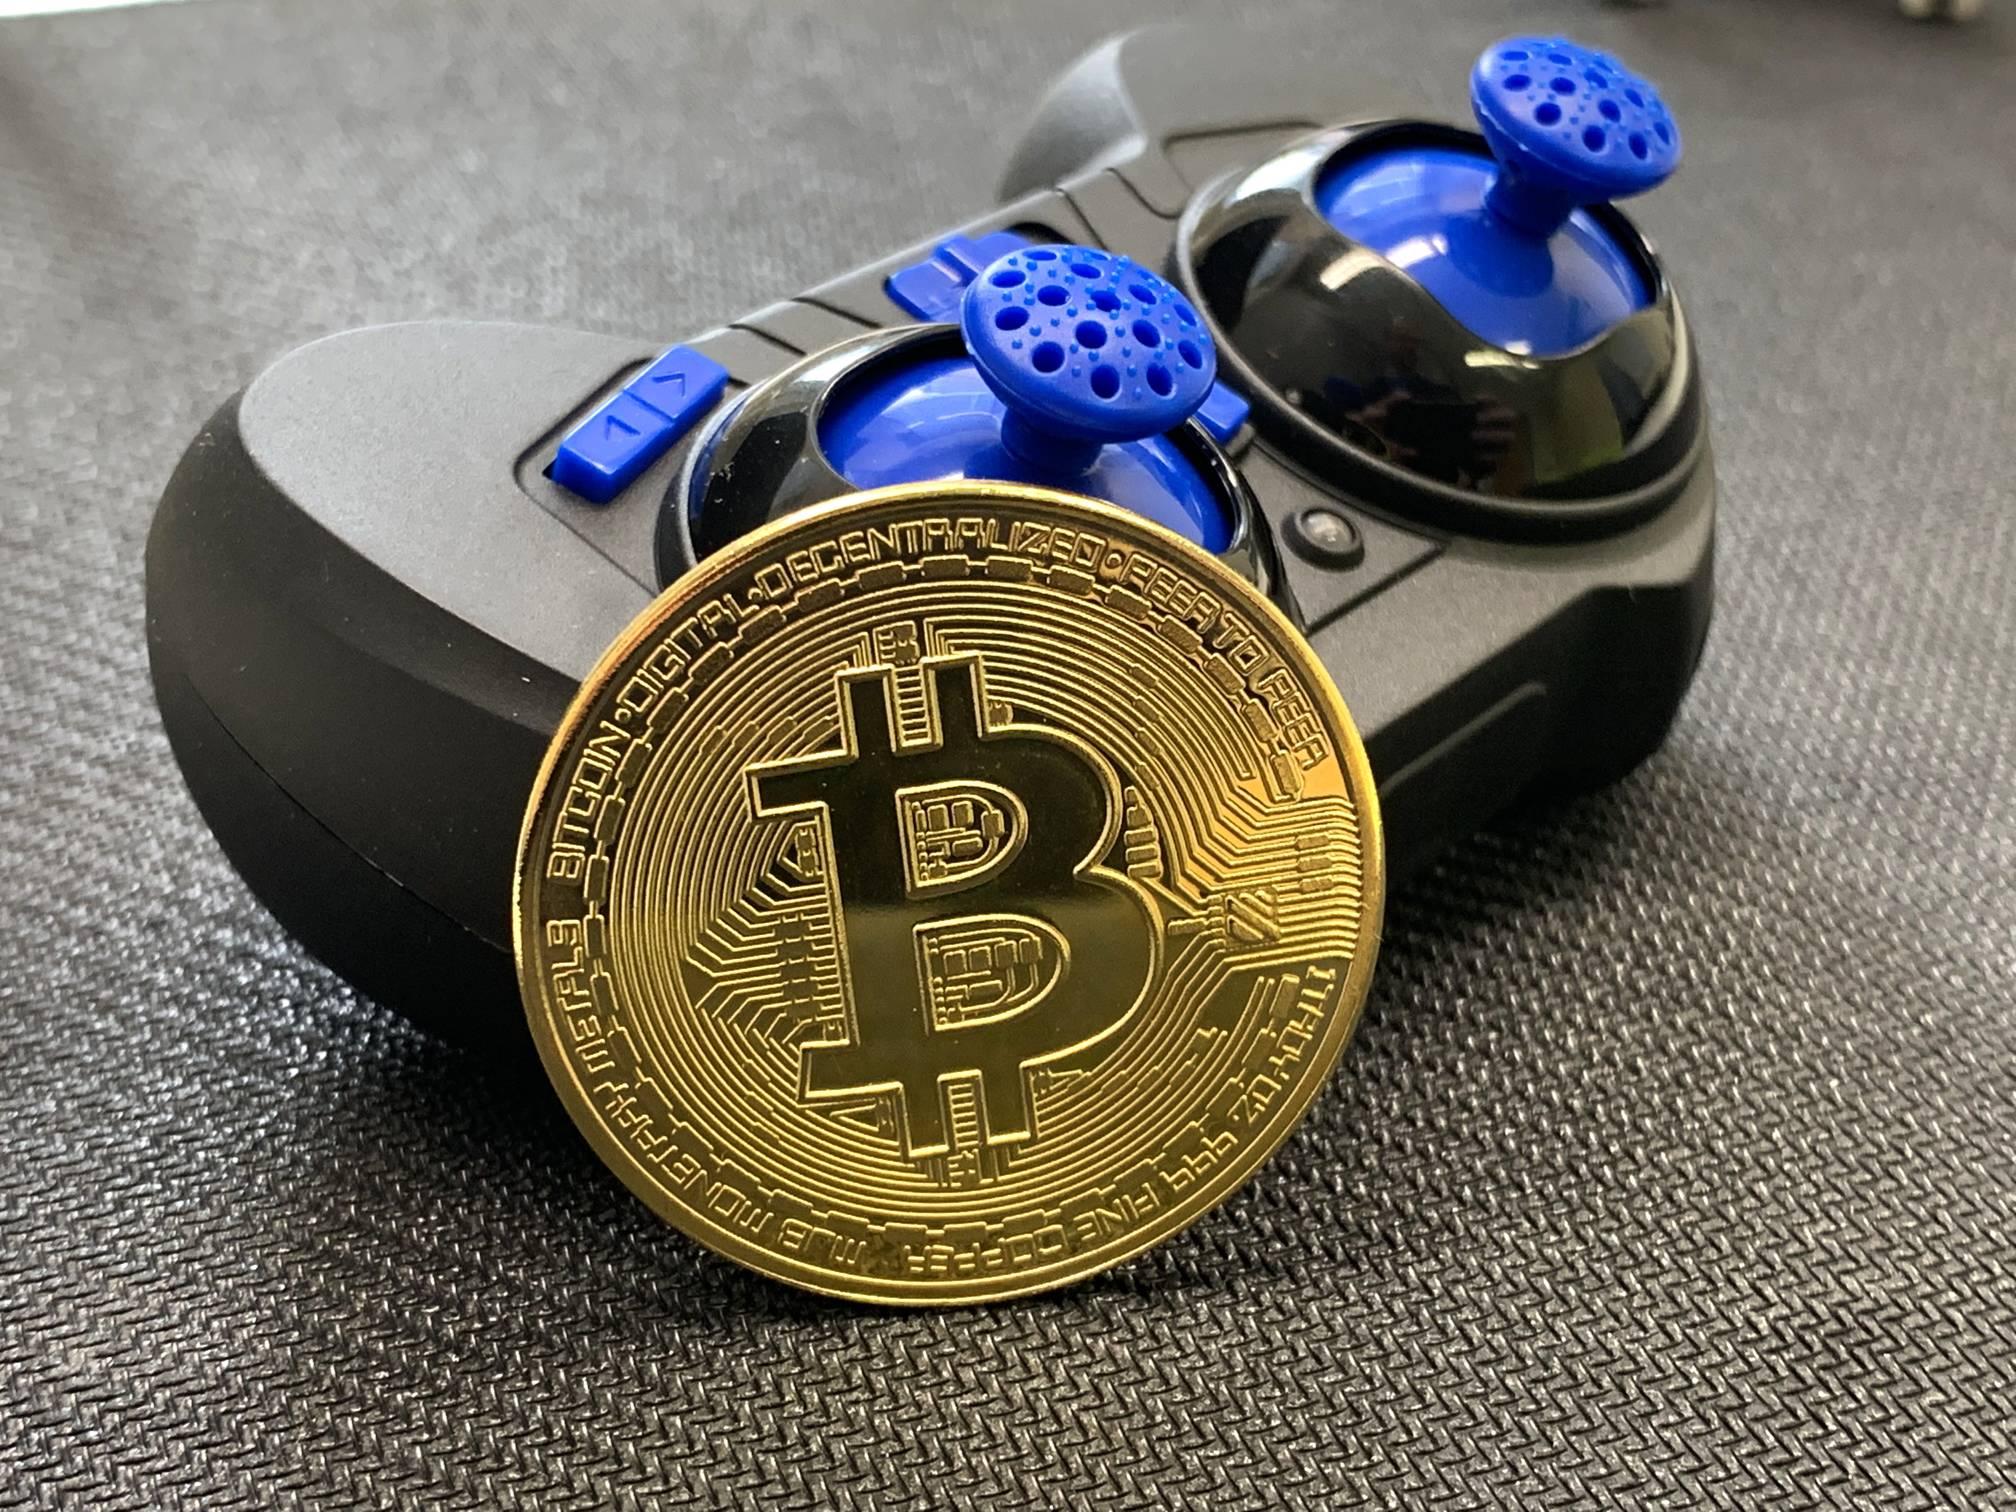 Bitcoin Chilling With Tiny Joystick